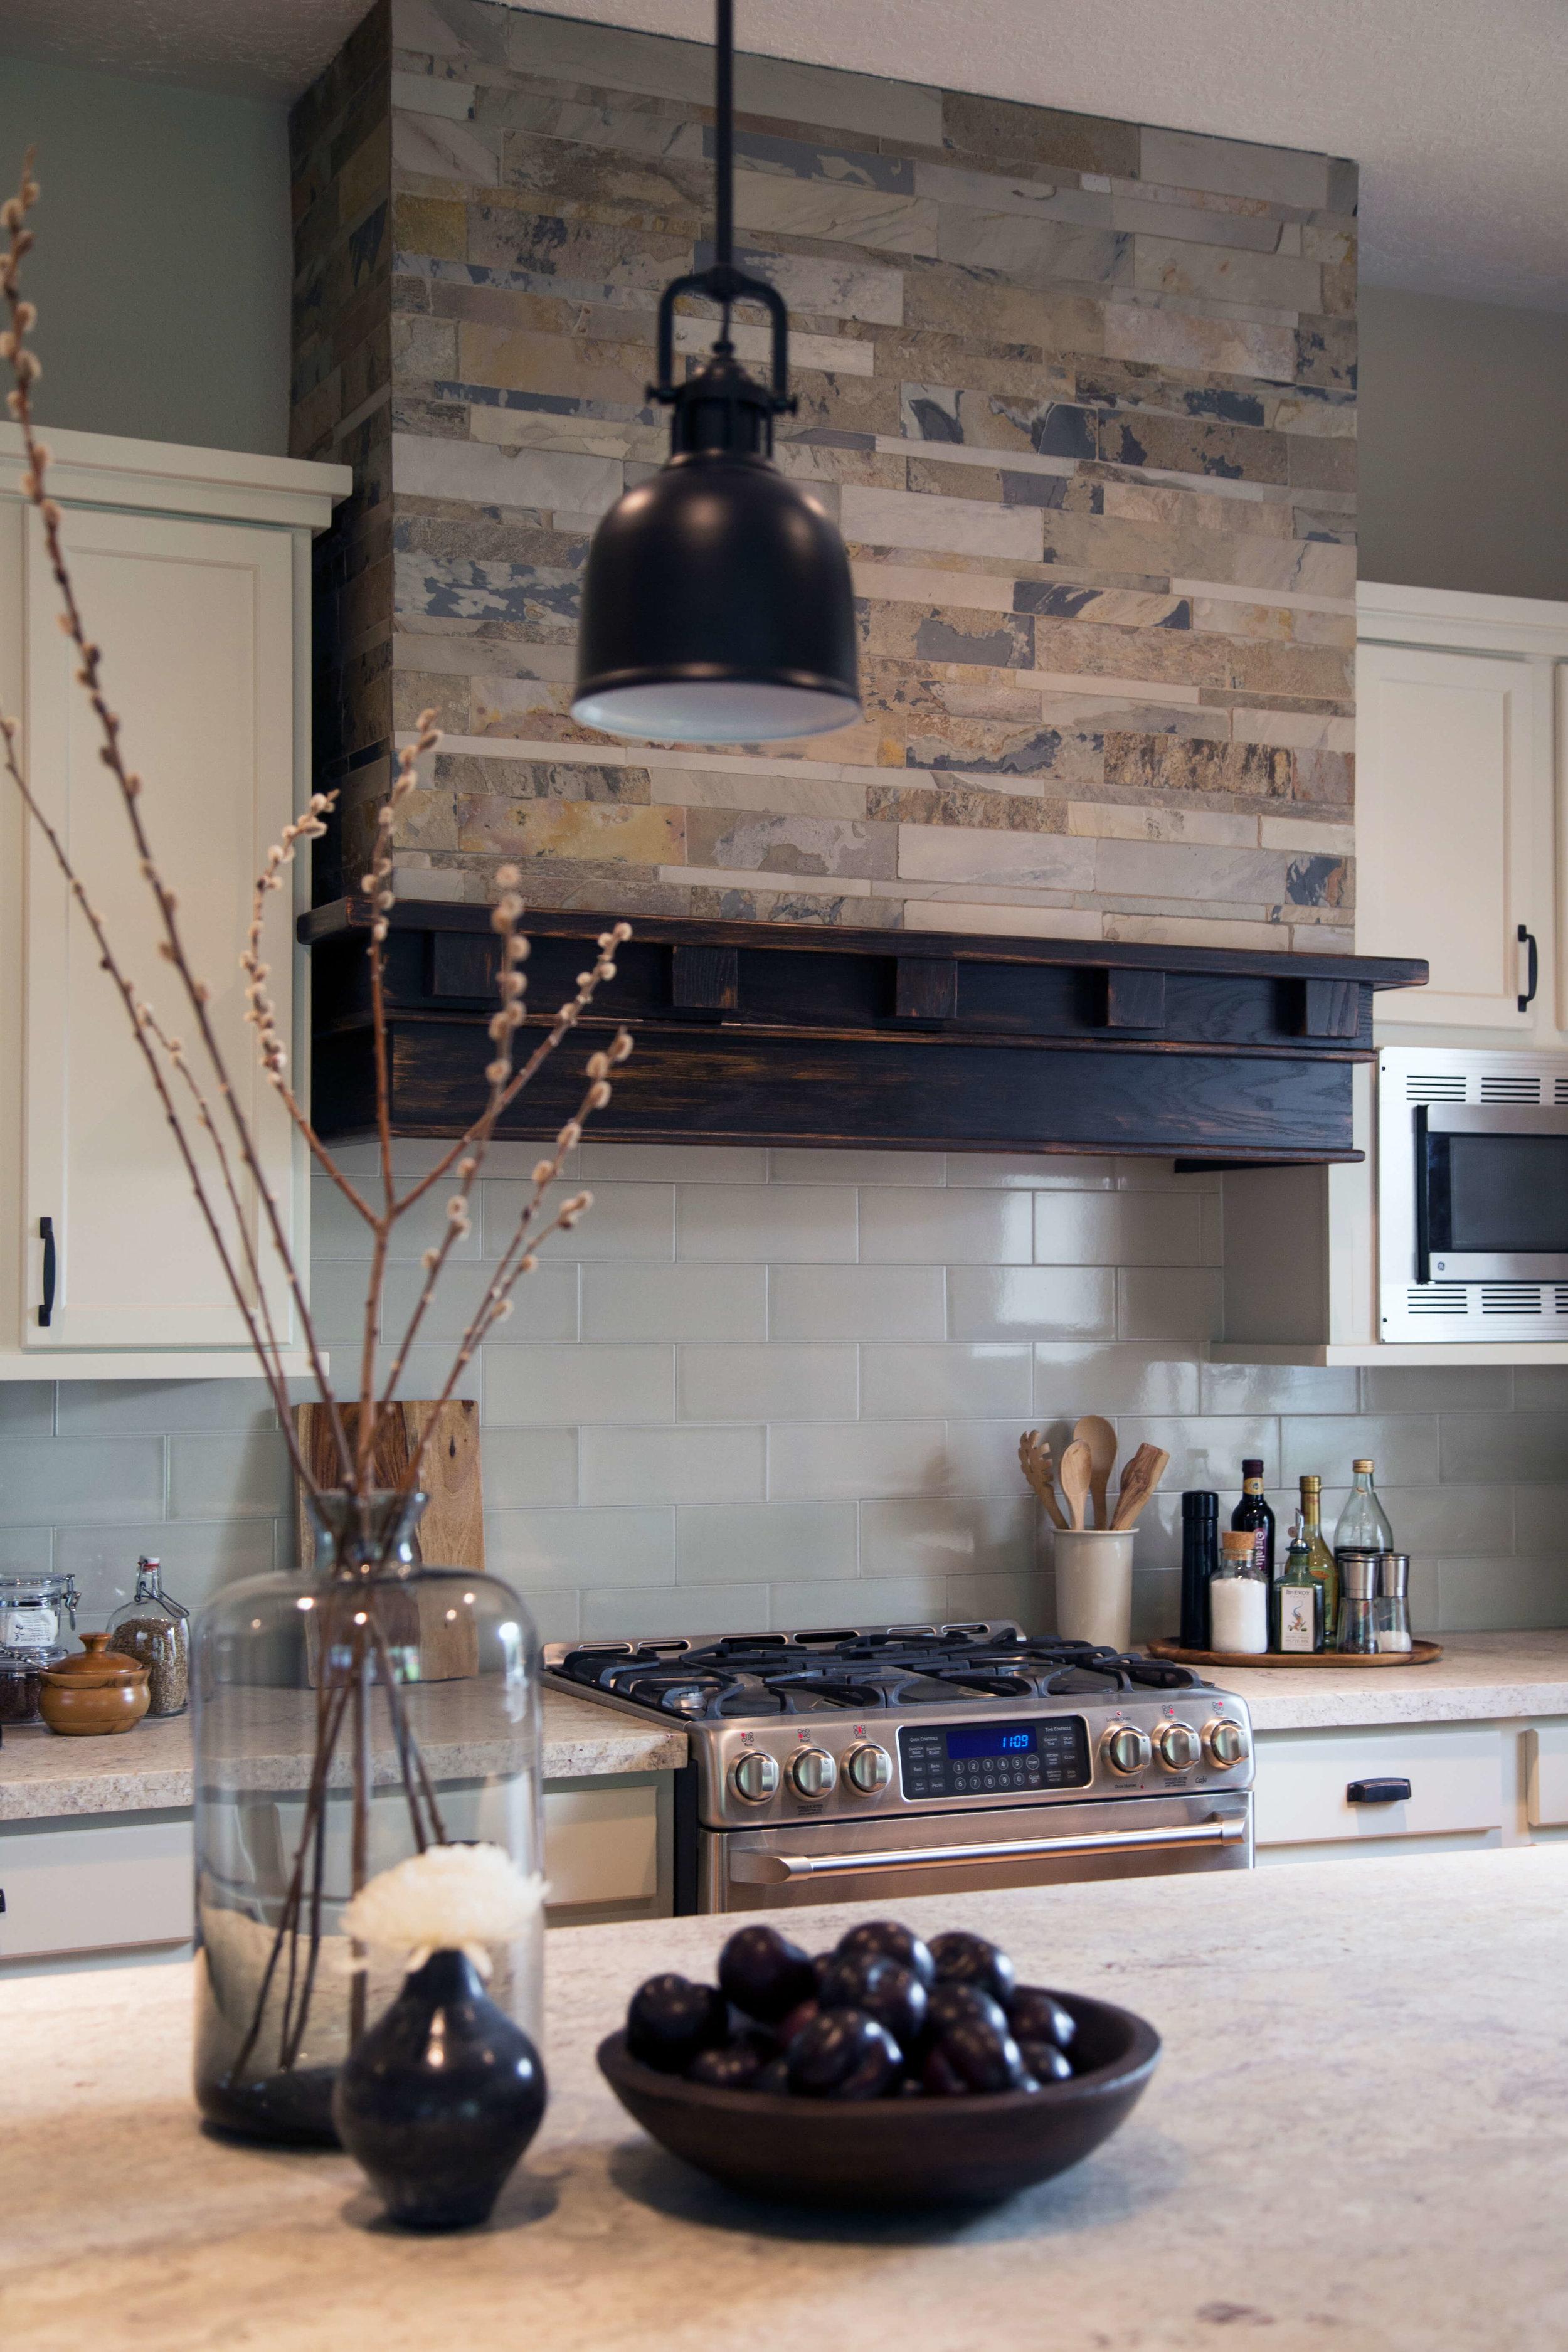 Kitchen styling tips - Carla Aston, Photographer: Tori Aston #kitchenstyling